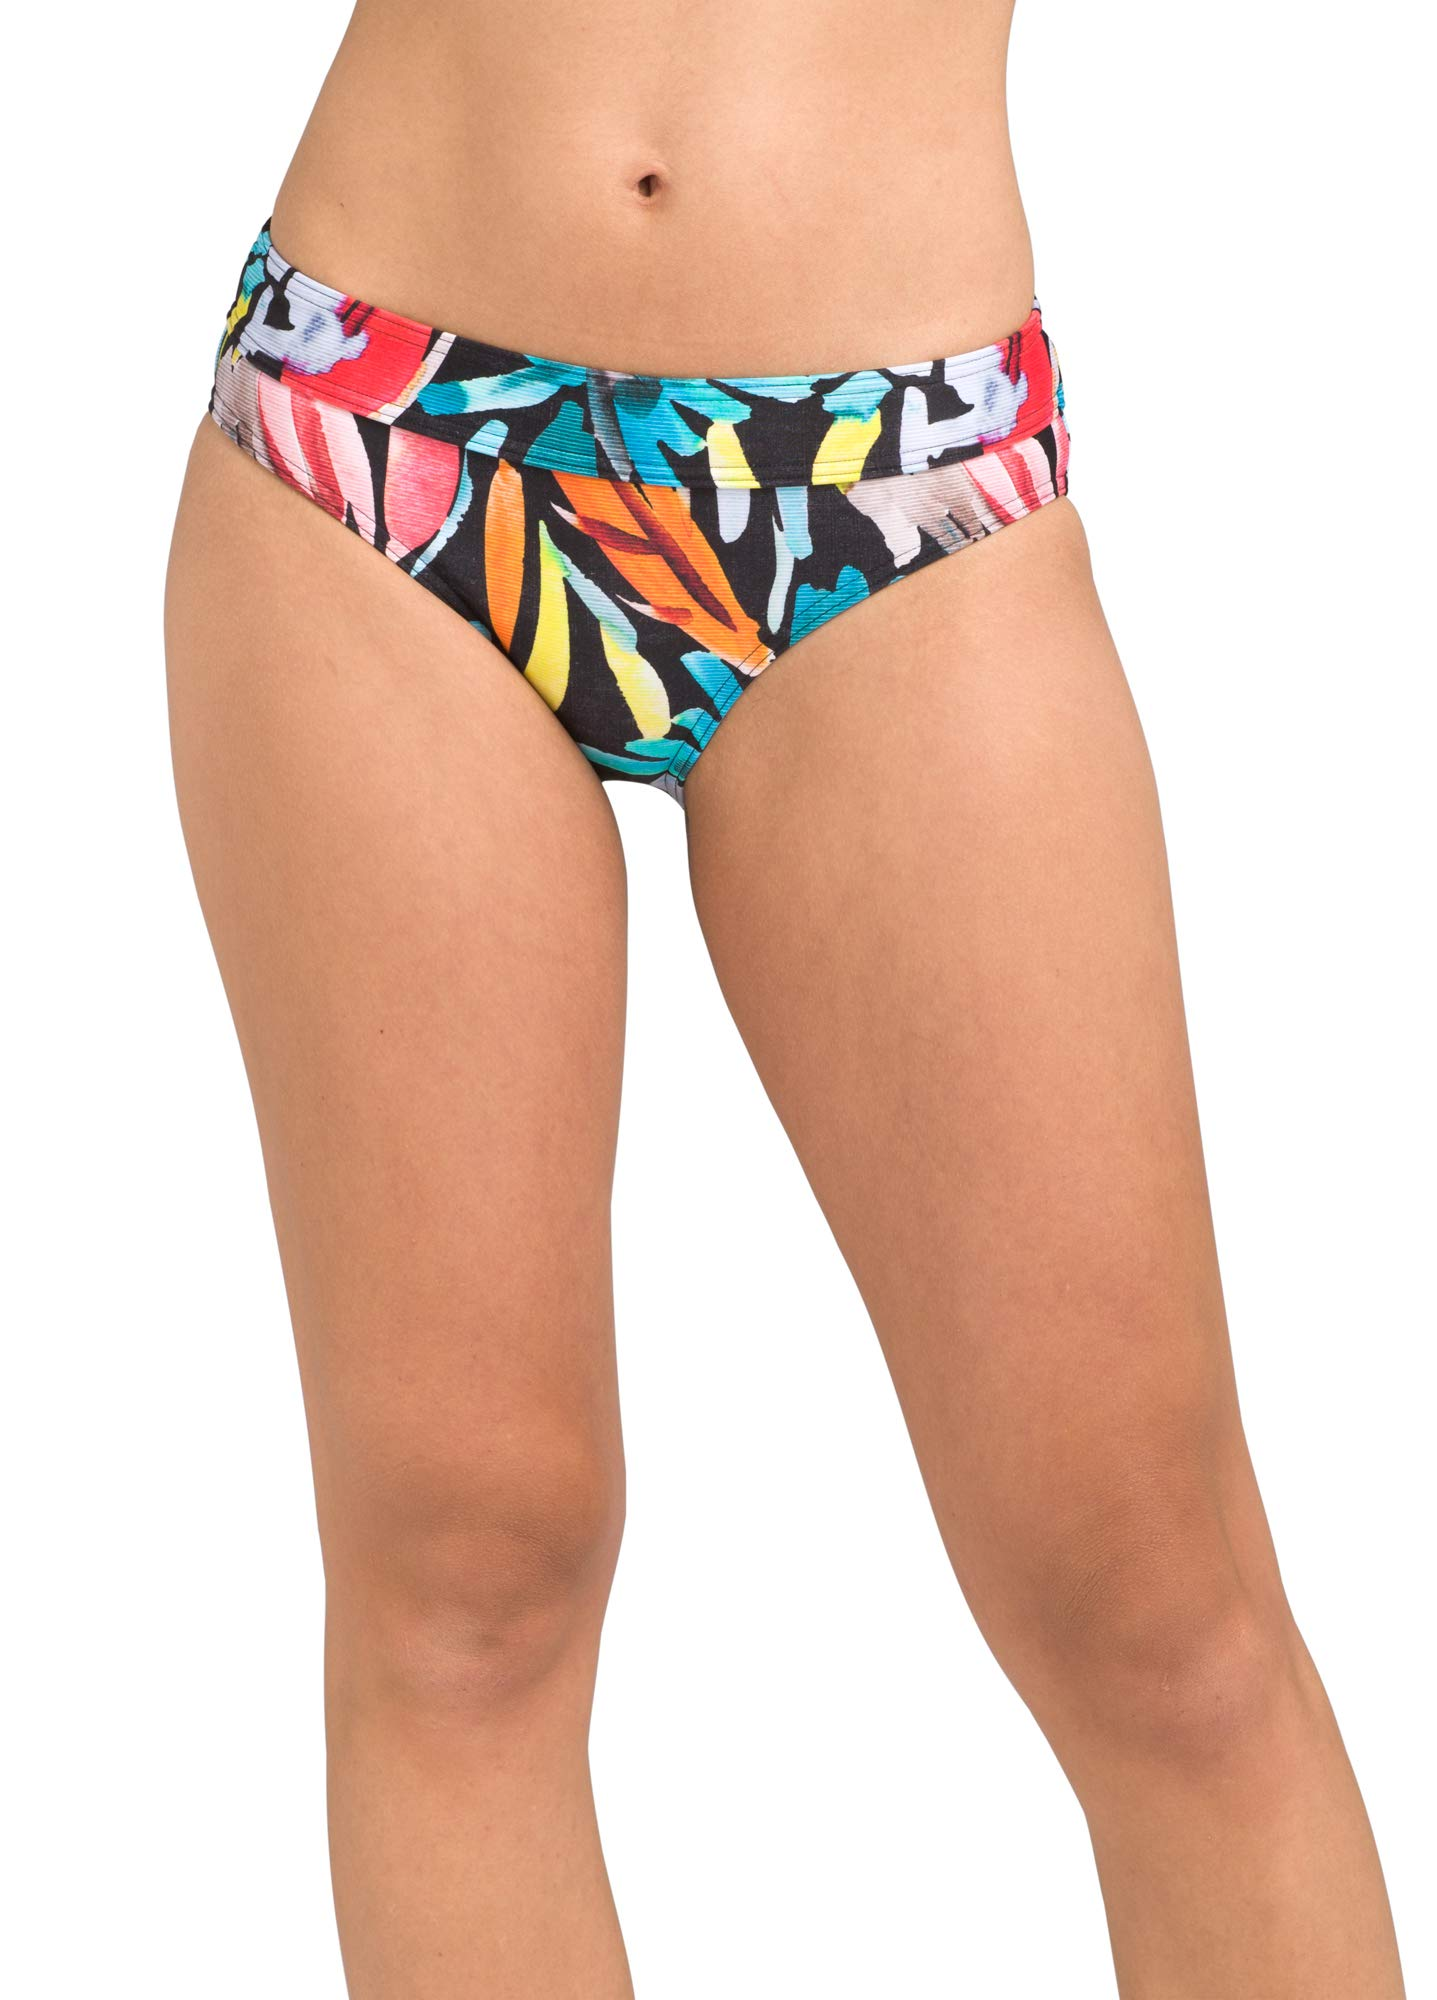 prAna - Women's Ramba Swim Bottoms, Hipster Briefs with Thick Elastic Band